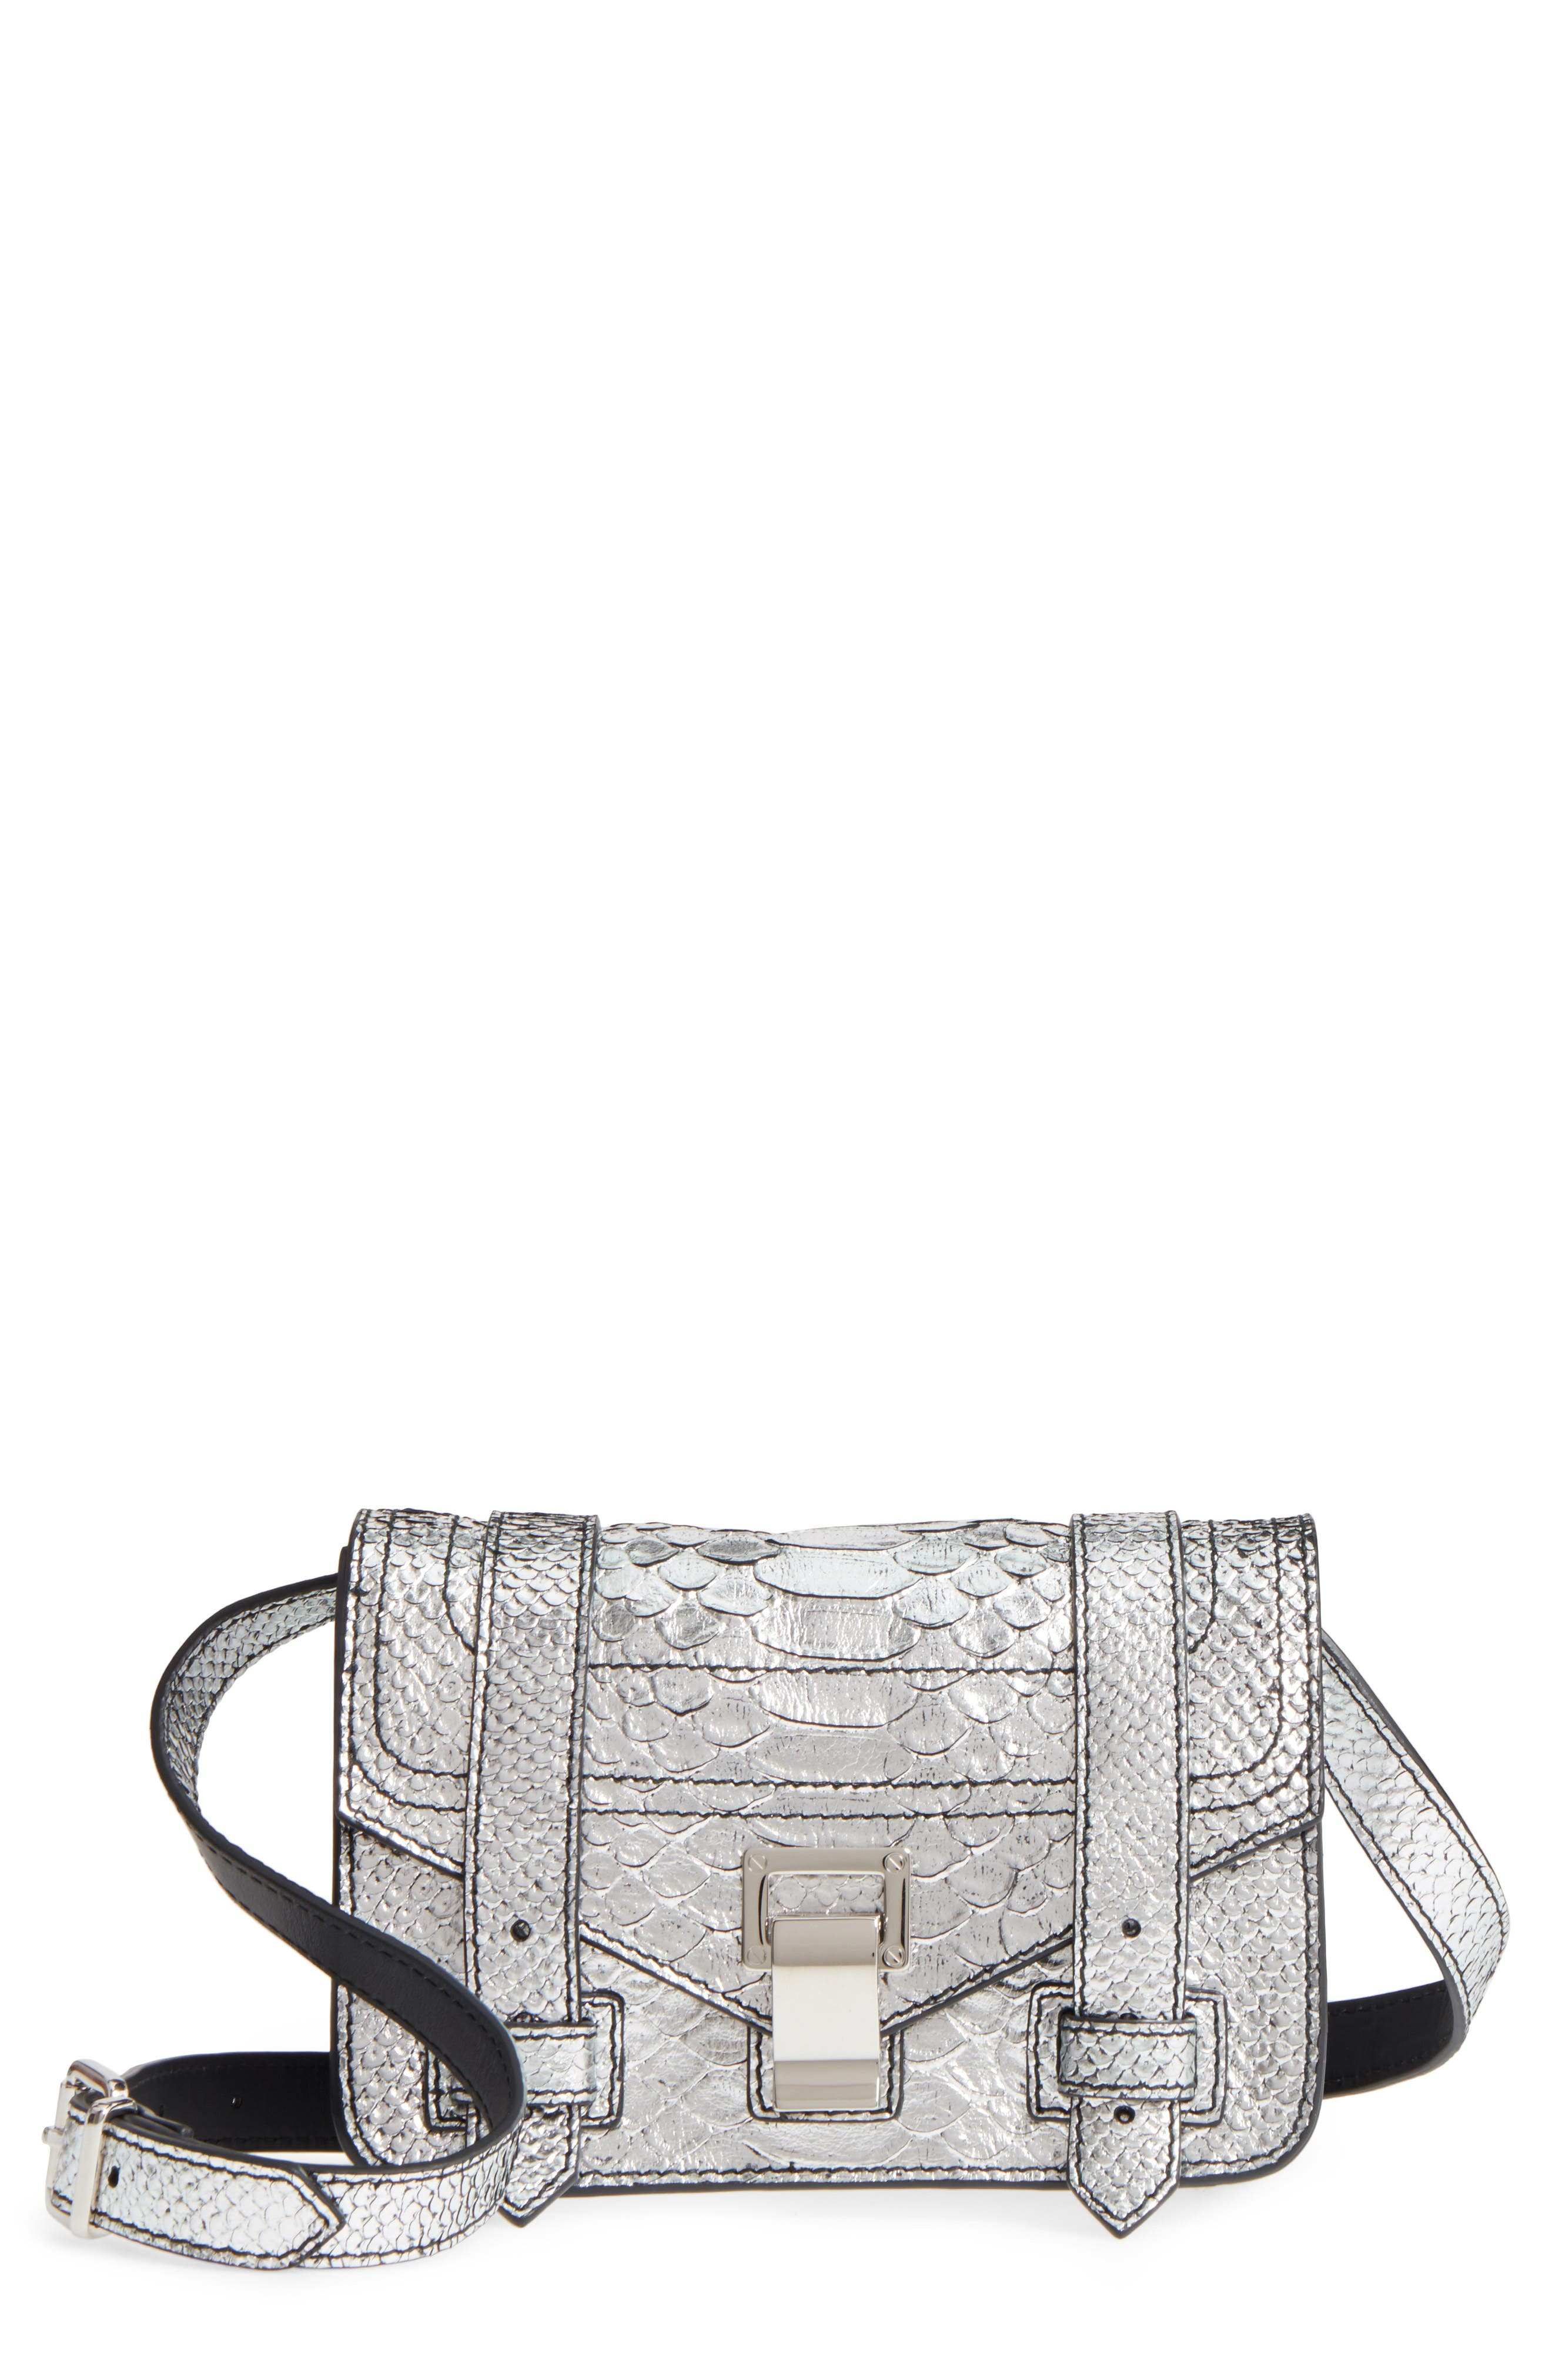 Mini PS1 Snakeskin Embossed Metallic Leather Crossbody Bag,                             Main thumbnail 1, color,                             040